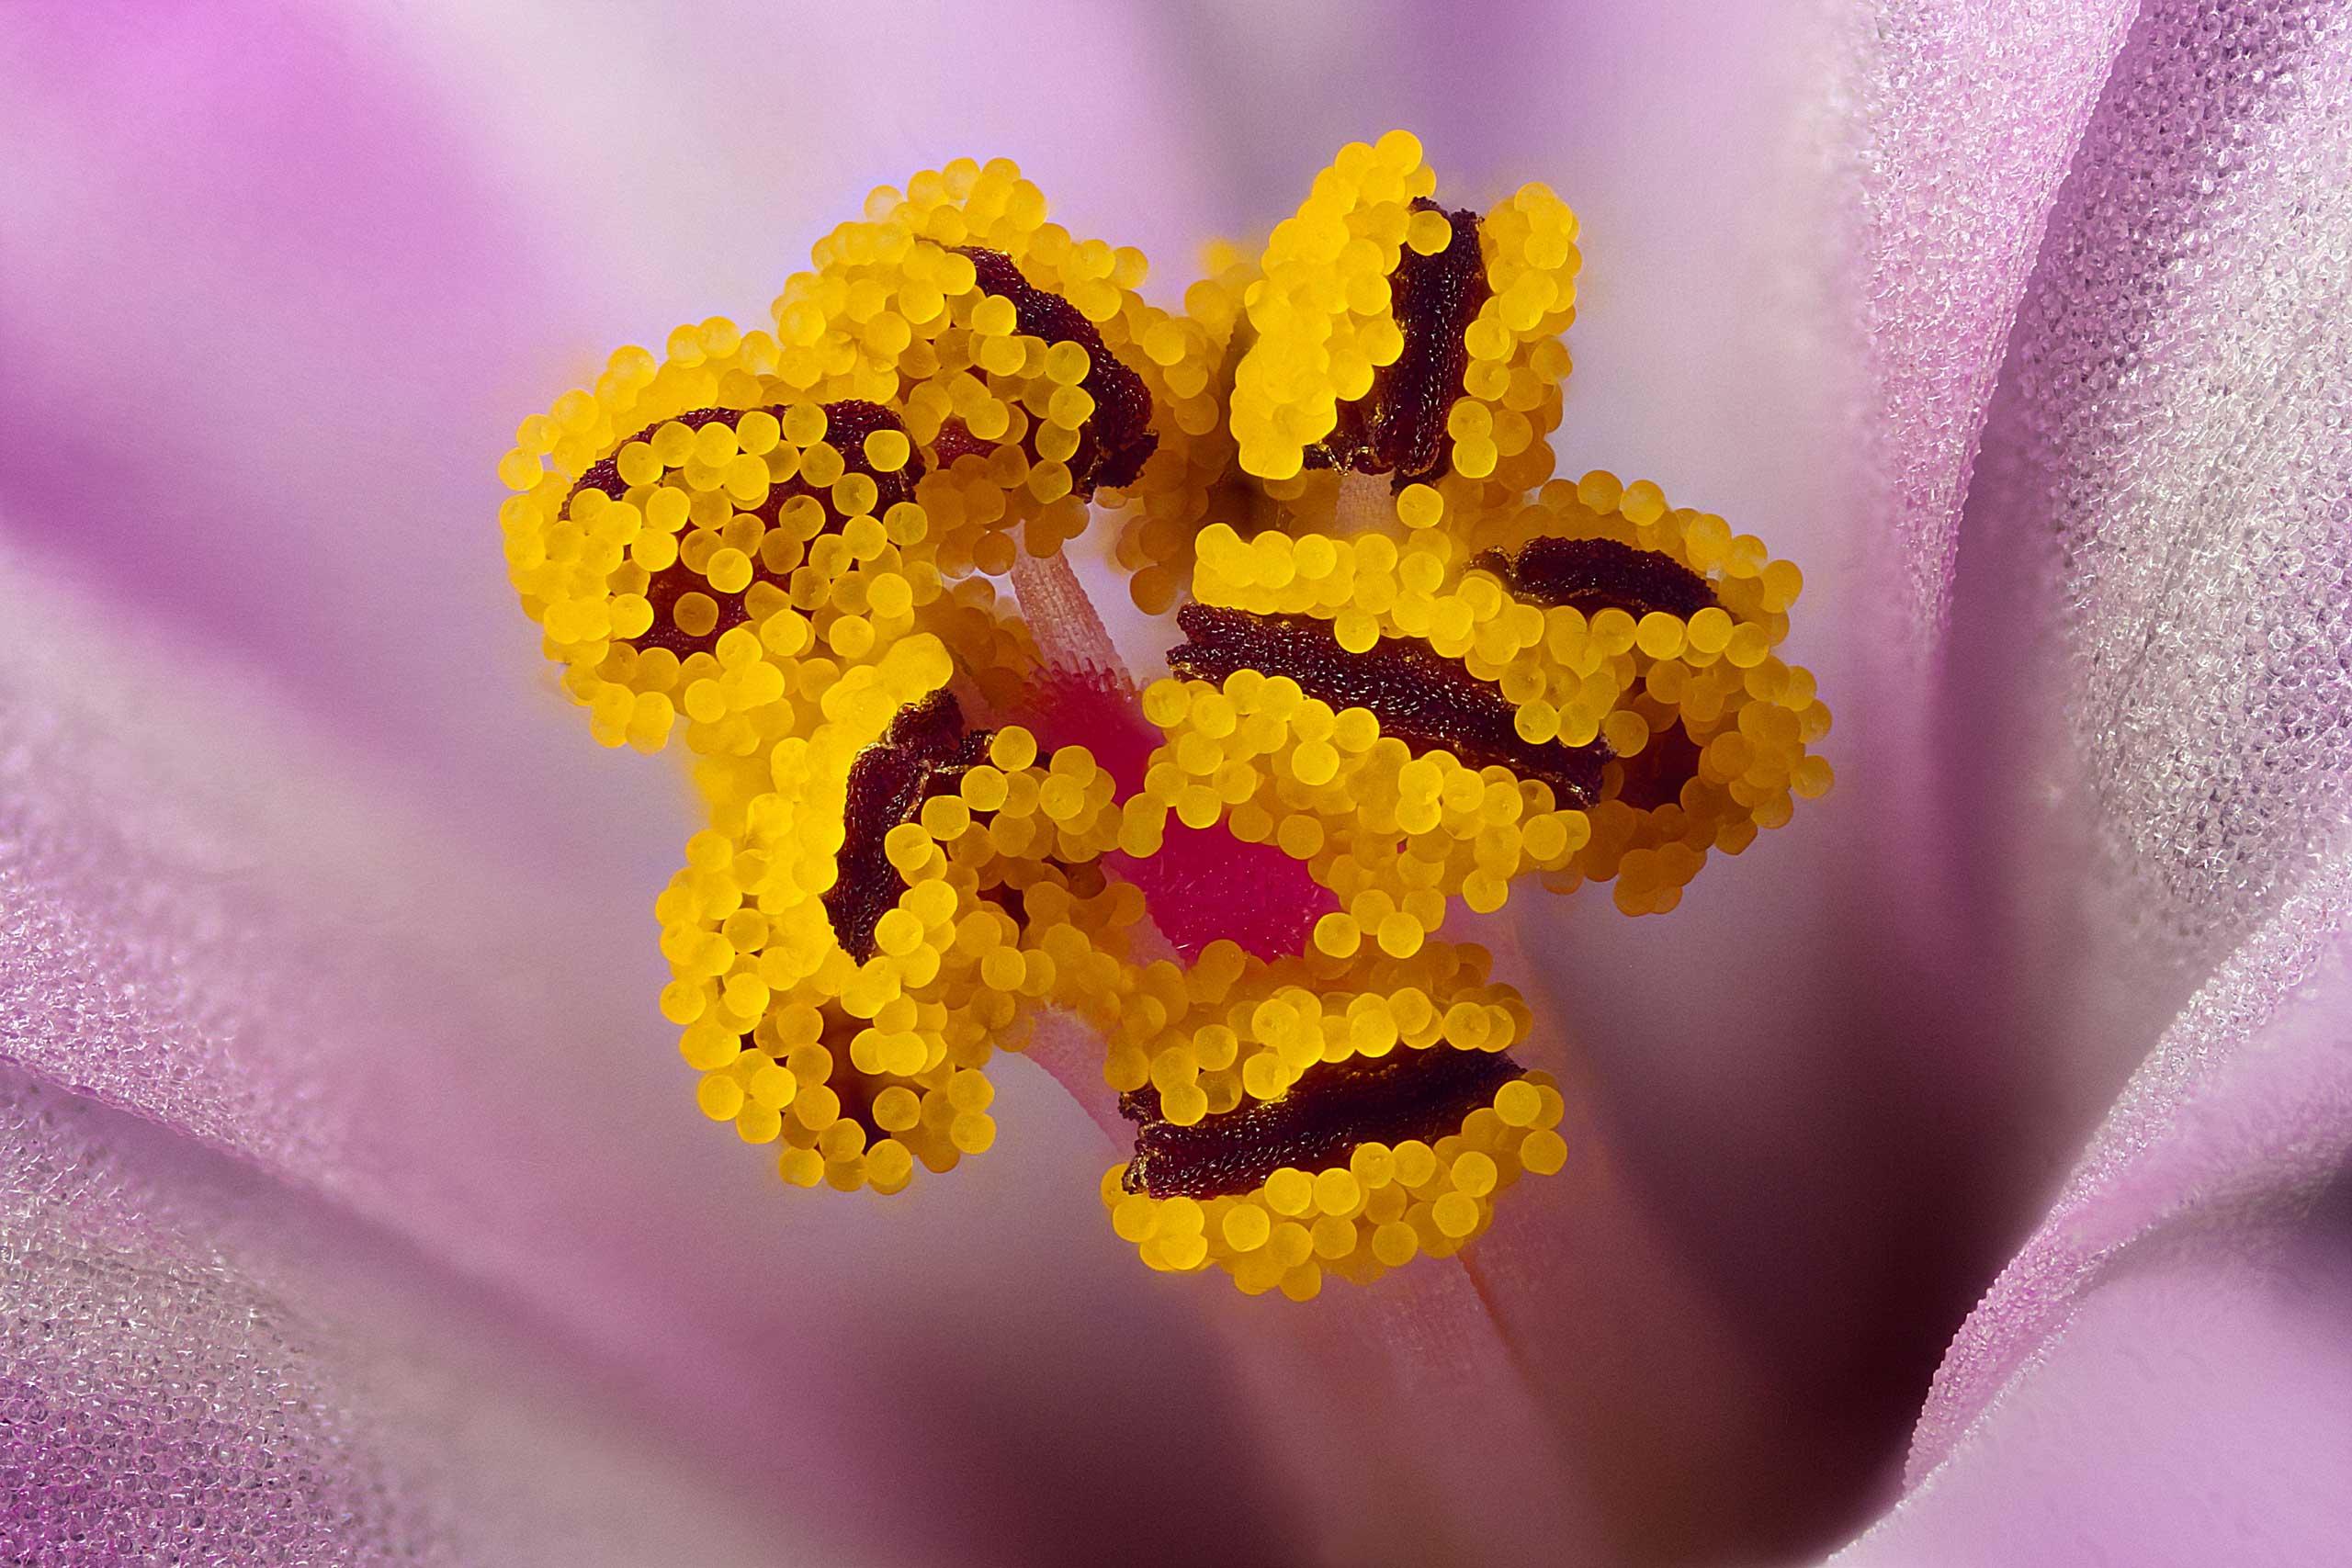 A geranium wildflower.